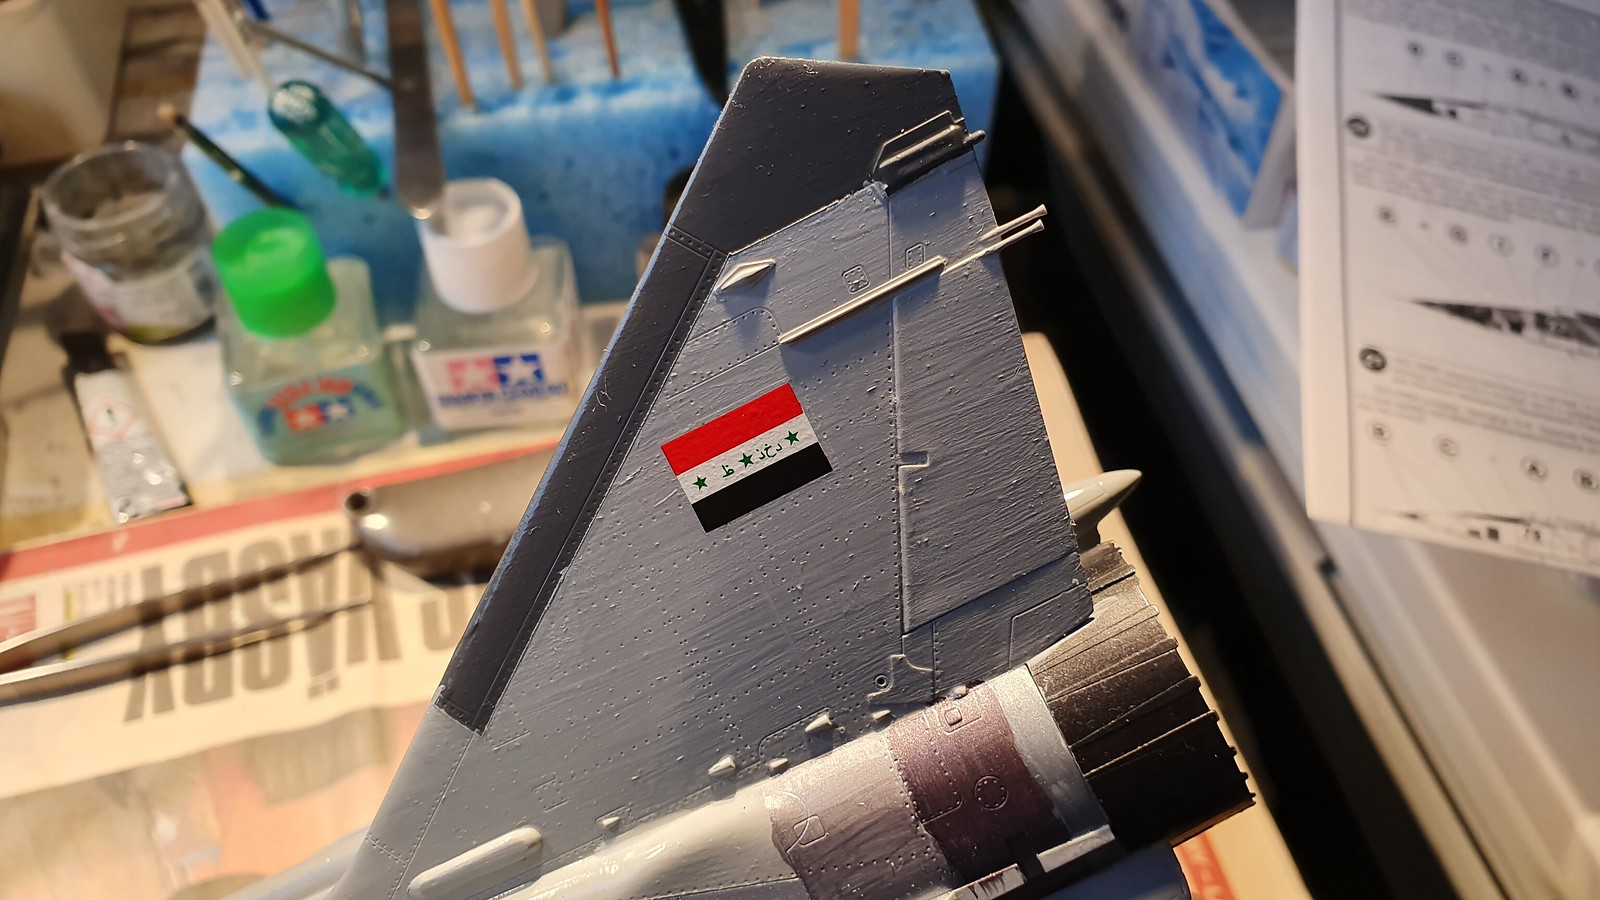 MiG-25BM Iraqi Air Force 1988 - ICM/Revell 1/48 + extra - Färdig! - Sida 7 48936313673_0b181736f6_h